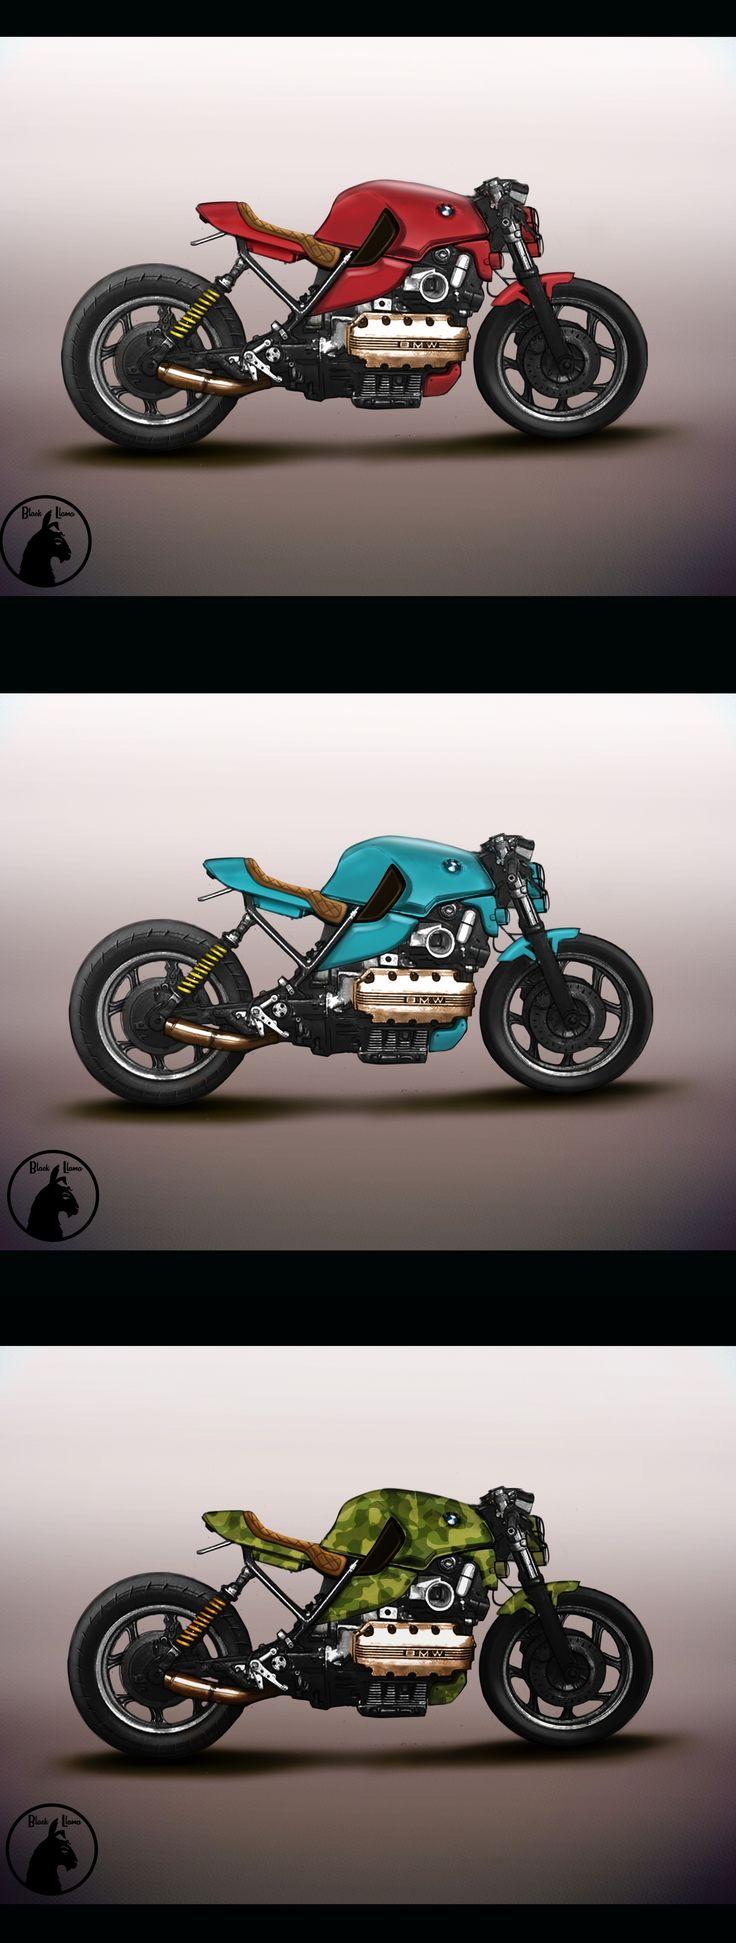 Bmw  color edit. Black Llama Design.